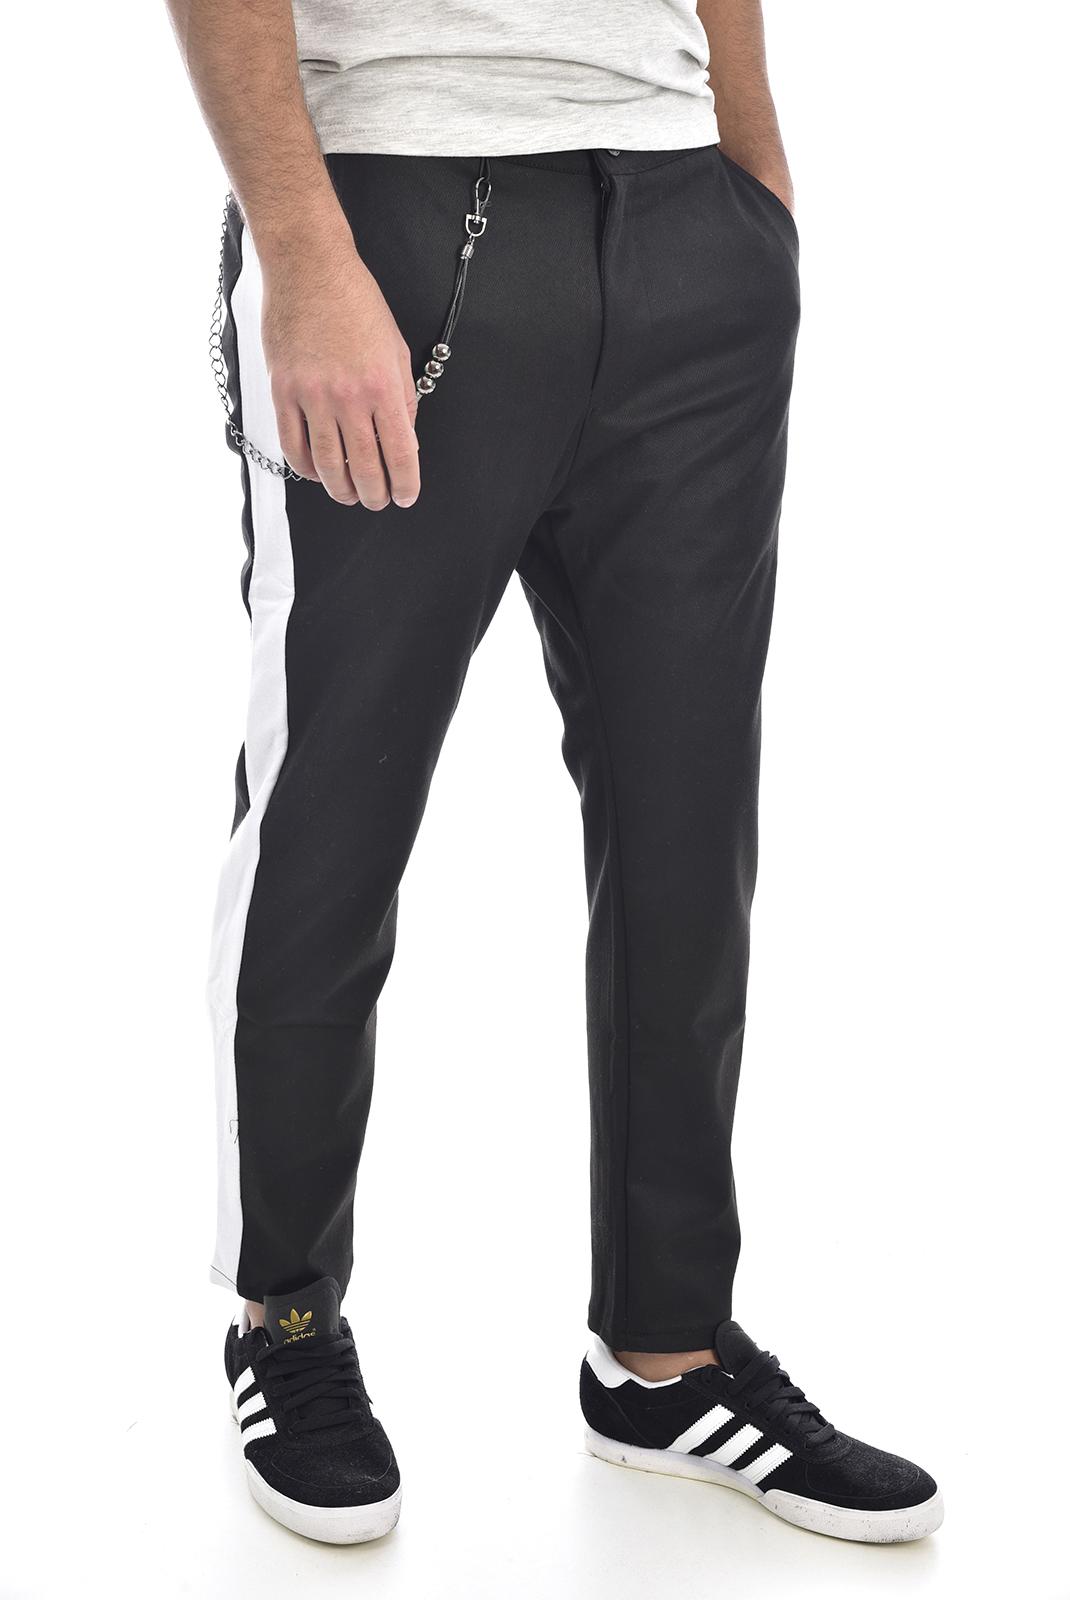 Pantalons chino/citadin  Goldenim paris 1352 NOIR/BLANC